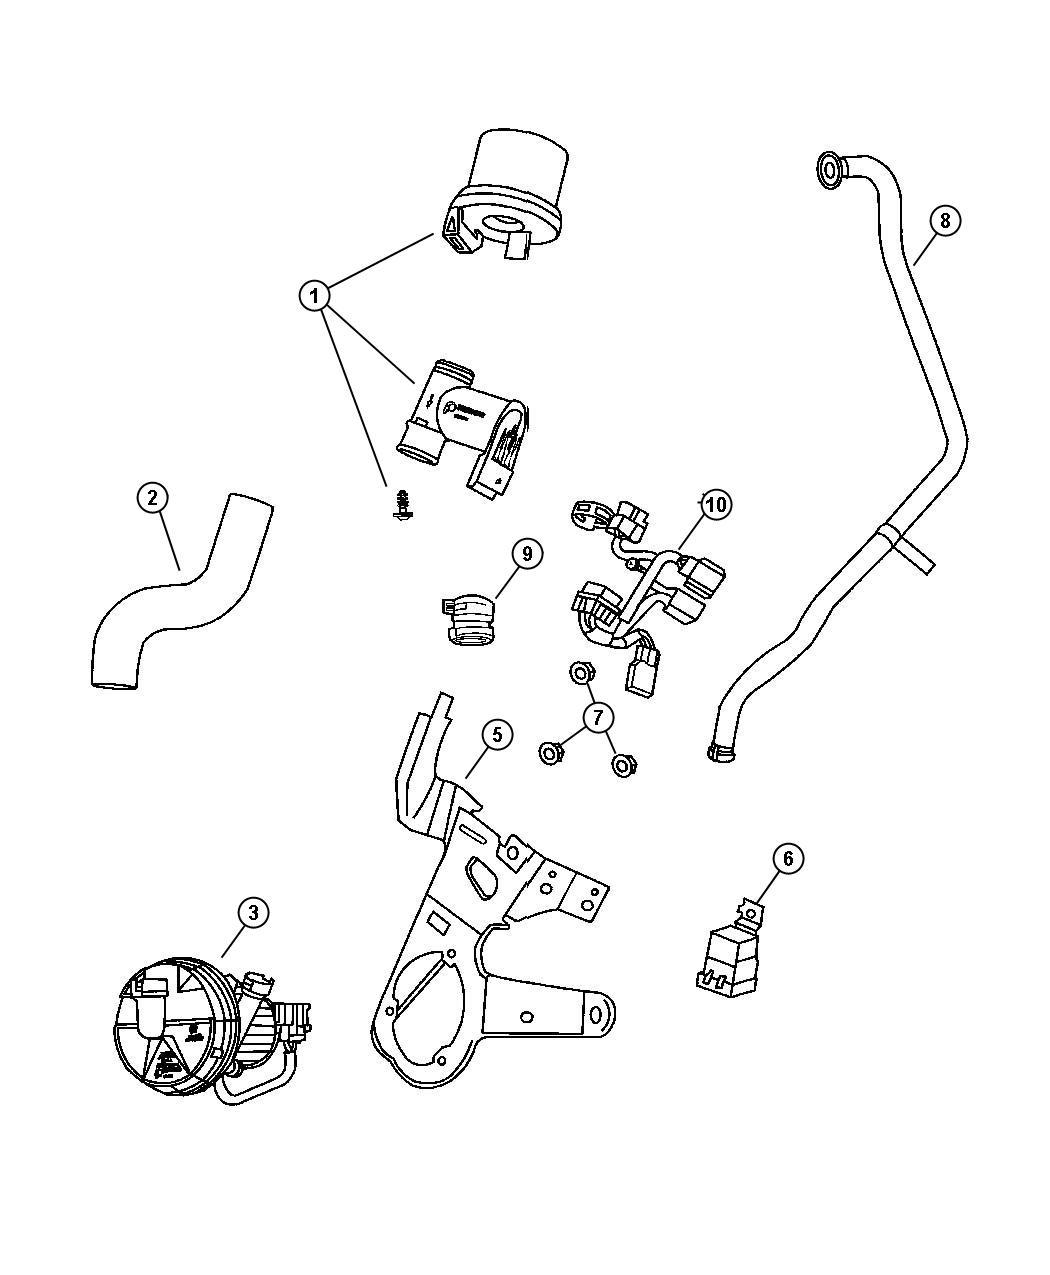 Dodge Stratus Tube. Air injection. Air pump to check valve